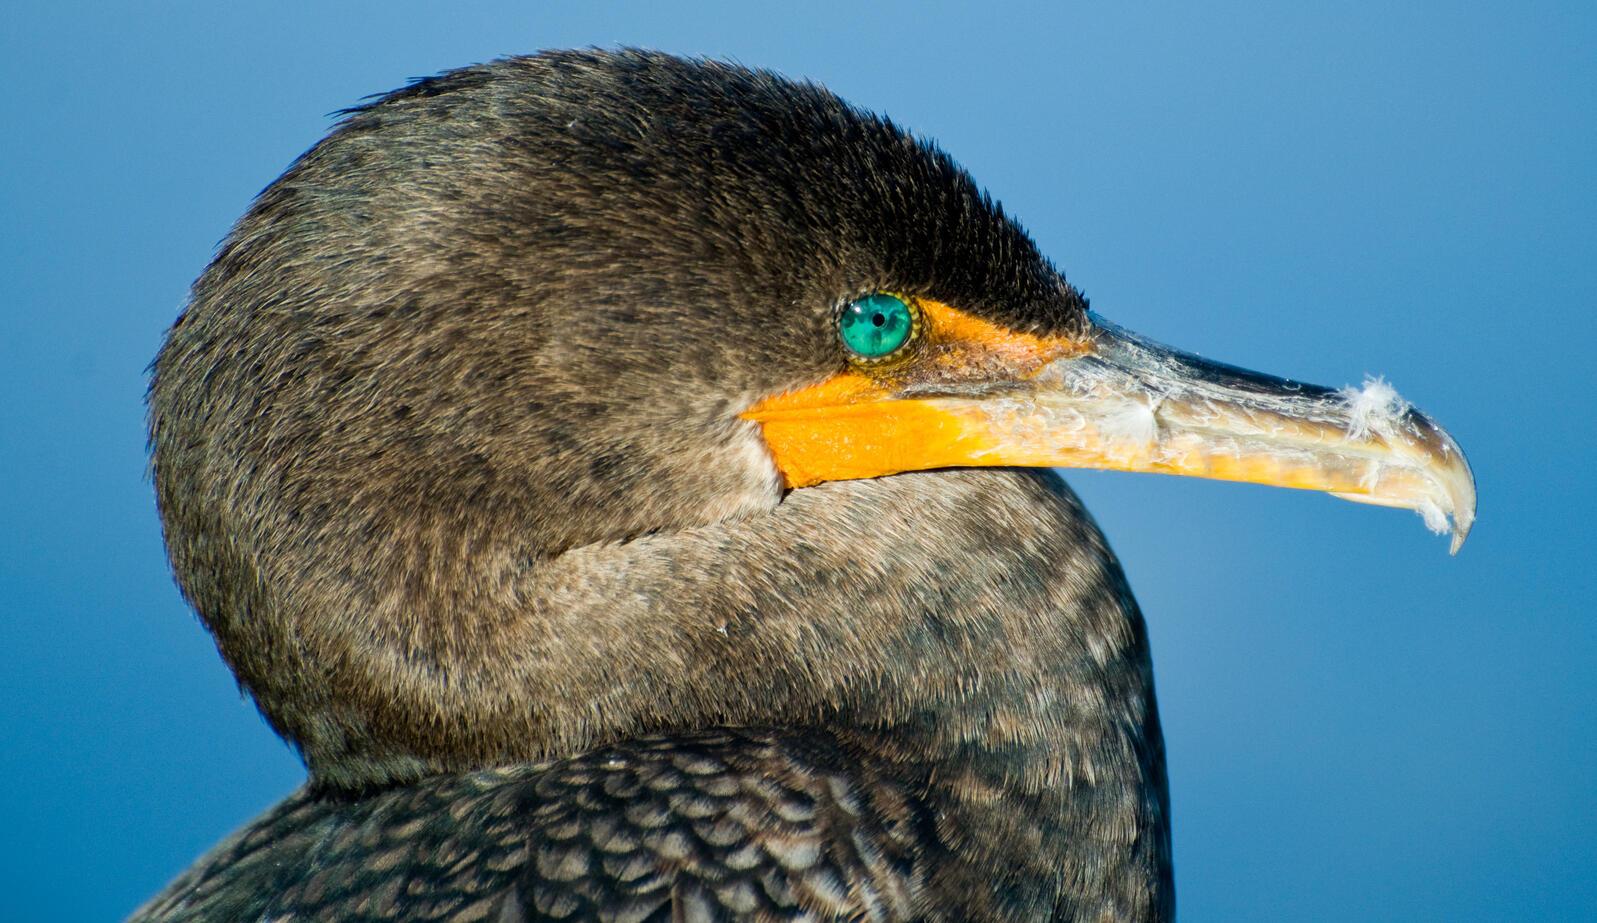 Double-crested Cormorant. Howard Izenwasser/Great Backyard Bird Count